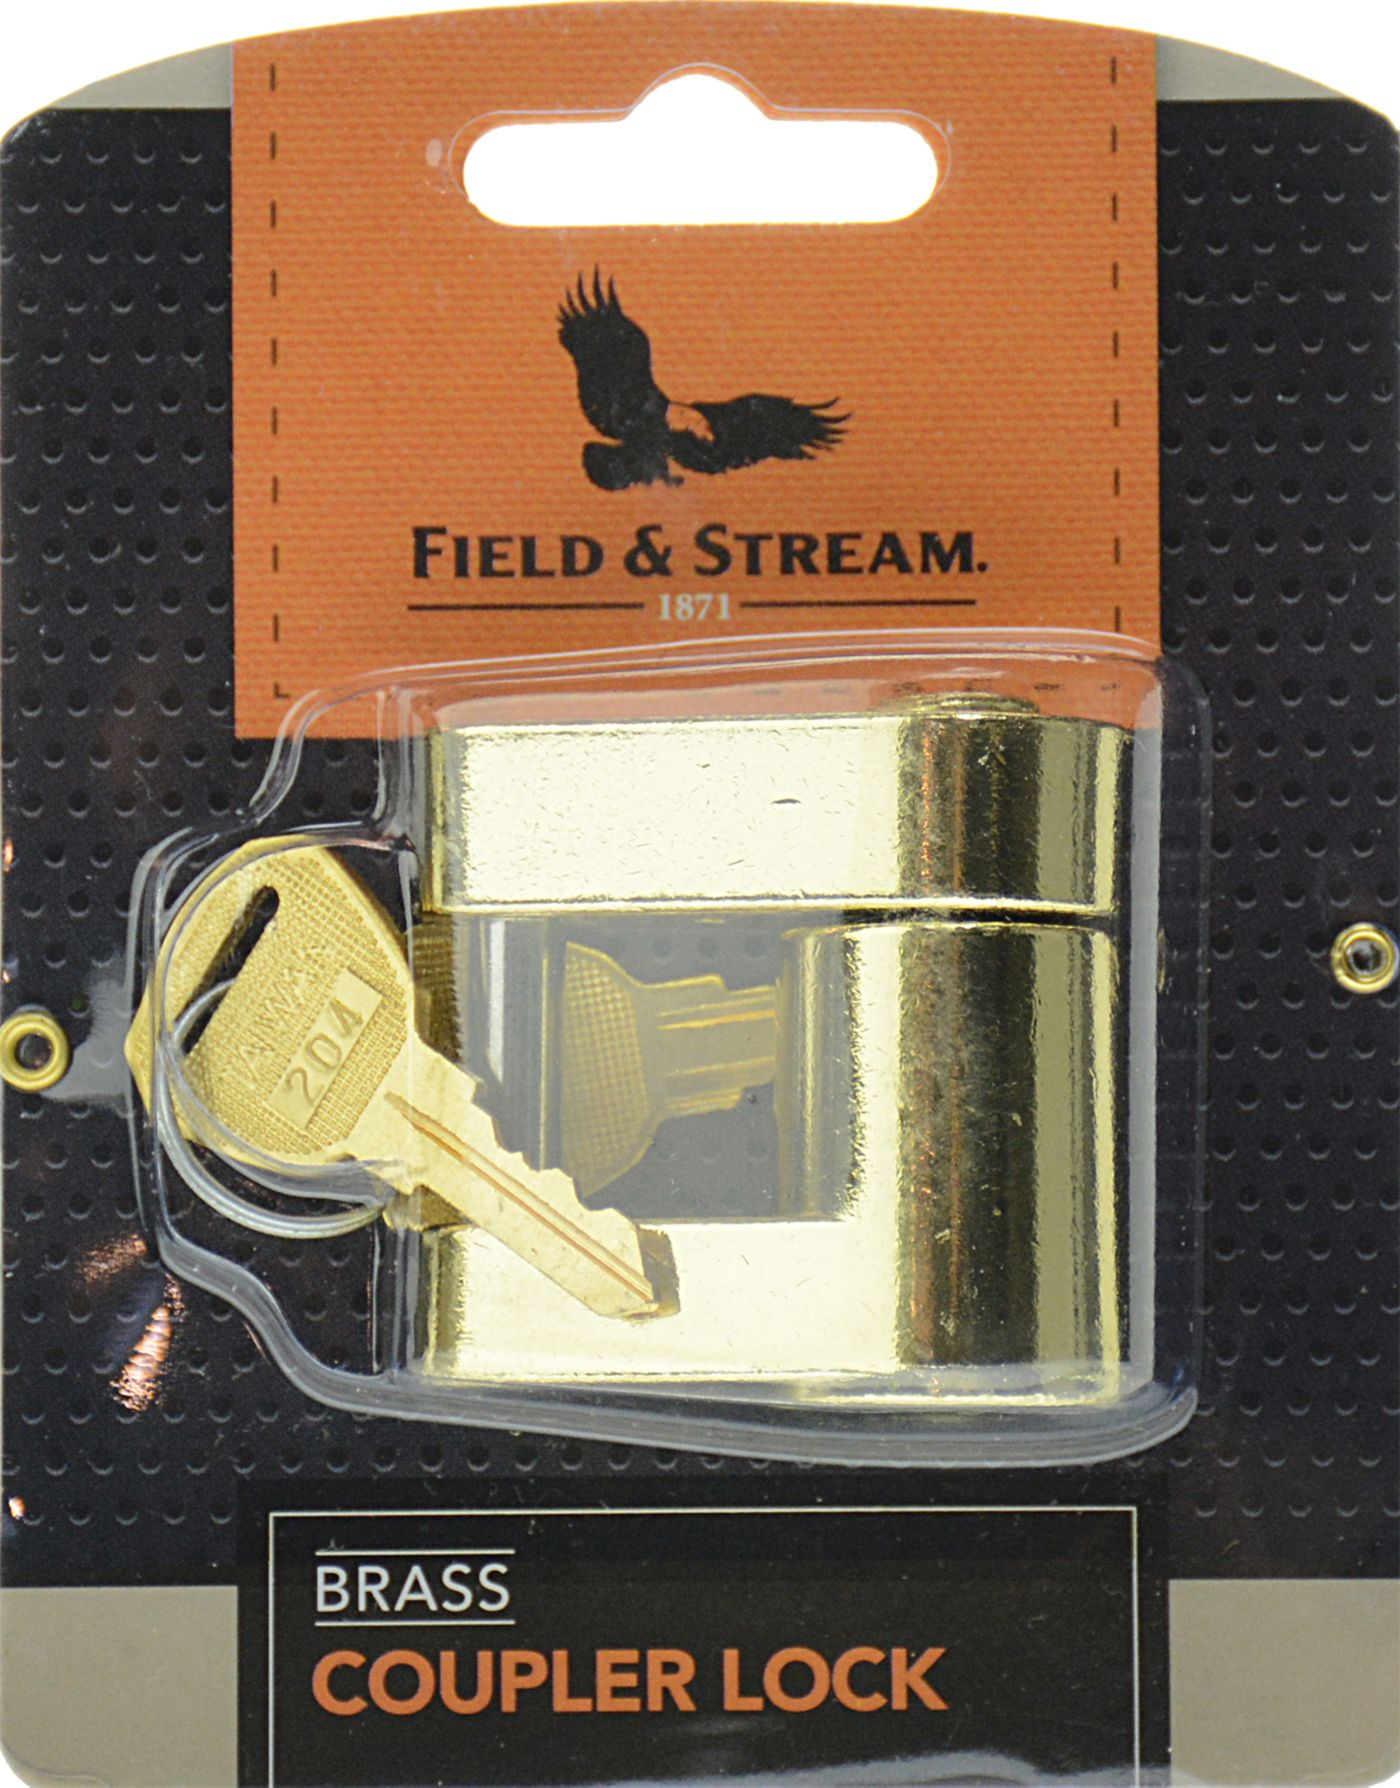 Field & Stream Brass Coupler Lock